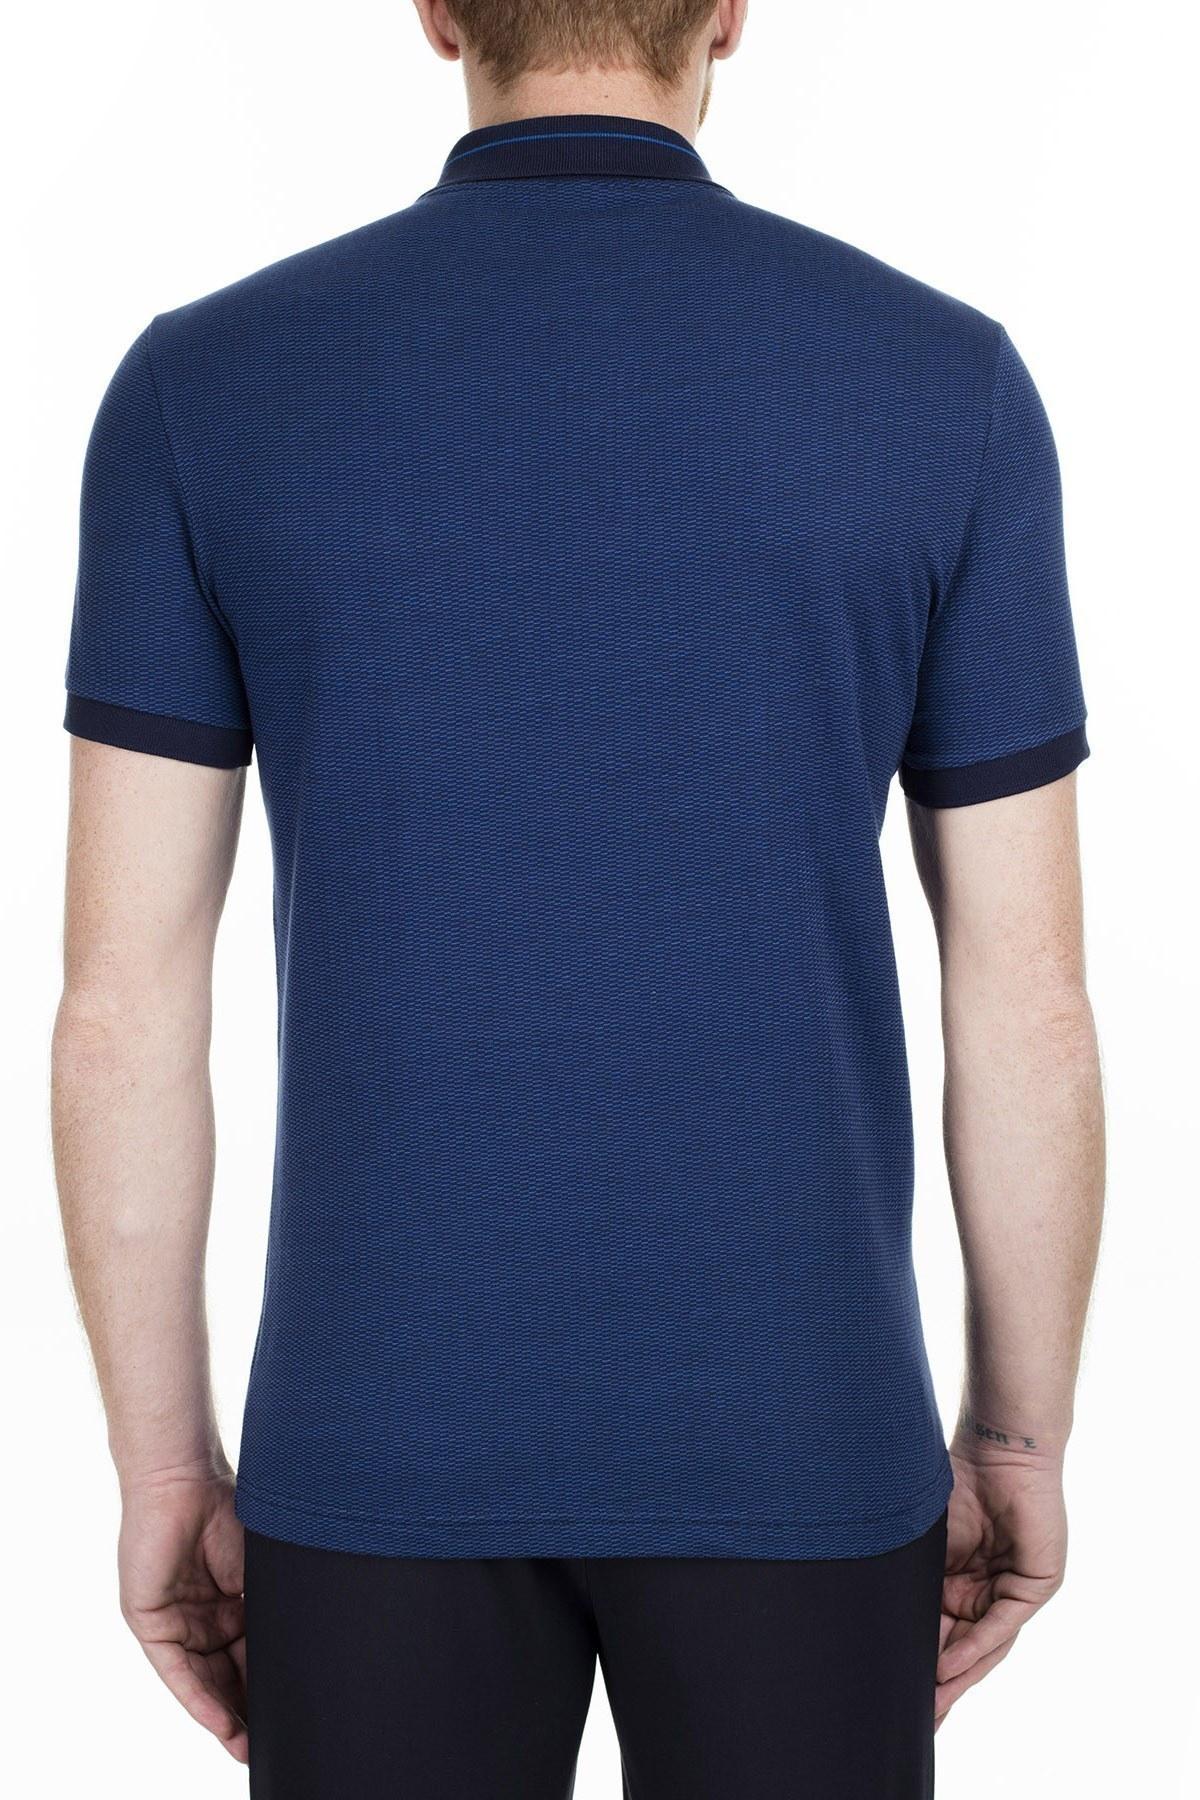 Lacoste Slim Fit T Shirt Erkek Polo PH0030 30L LACİVERT